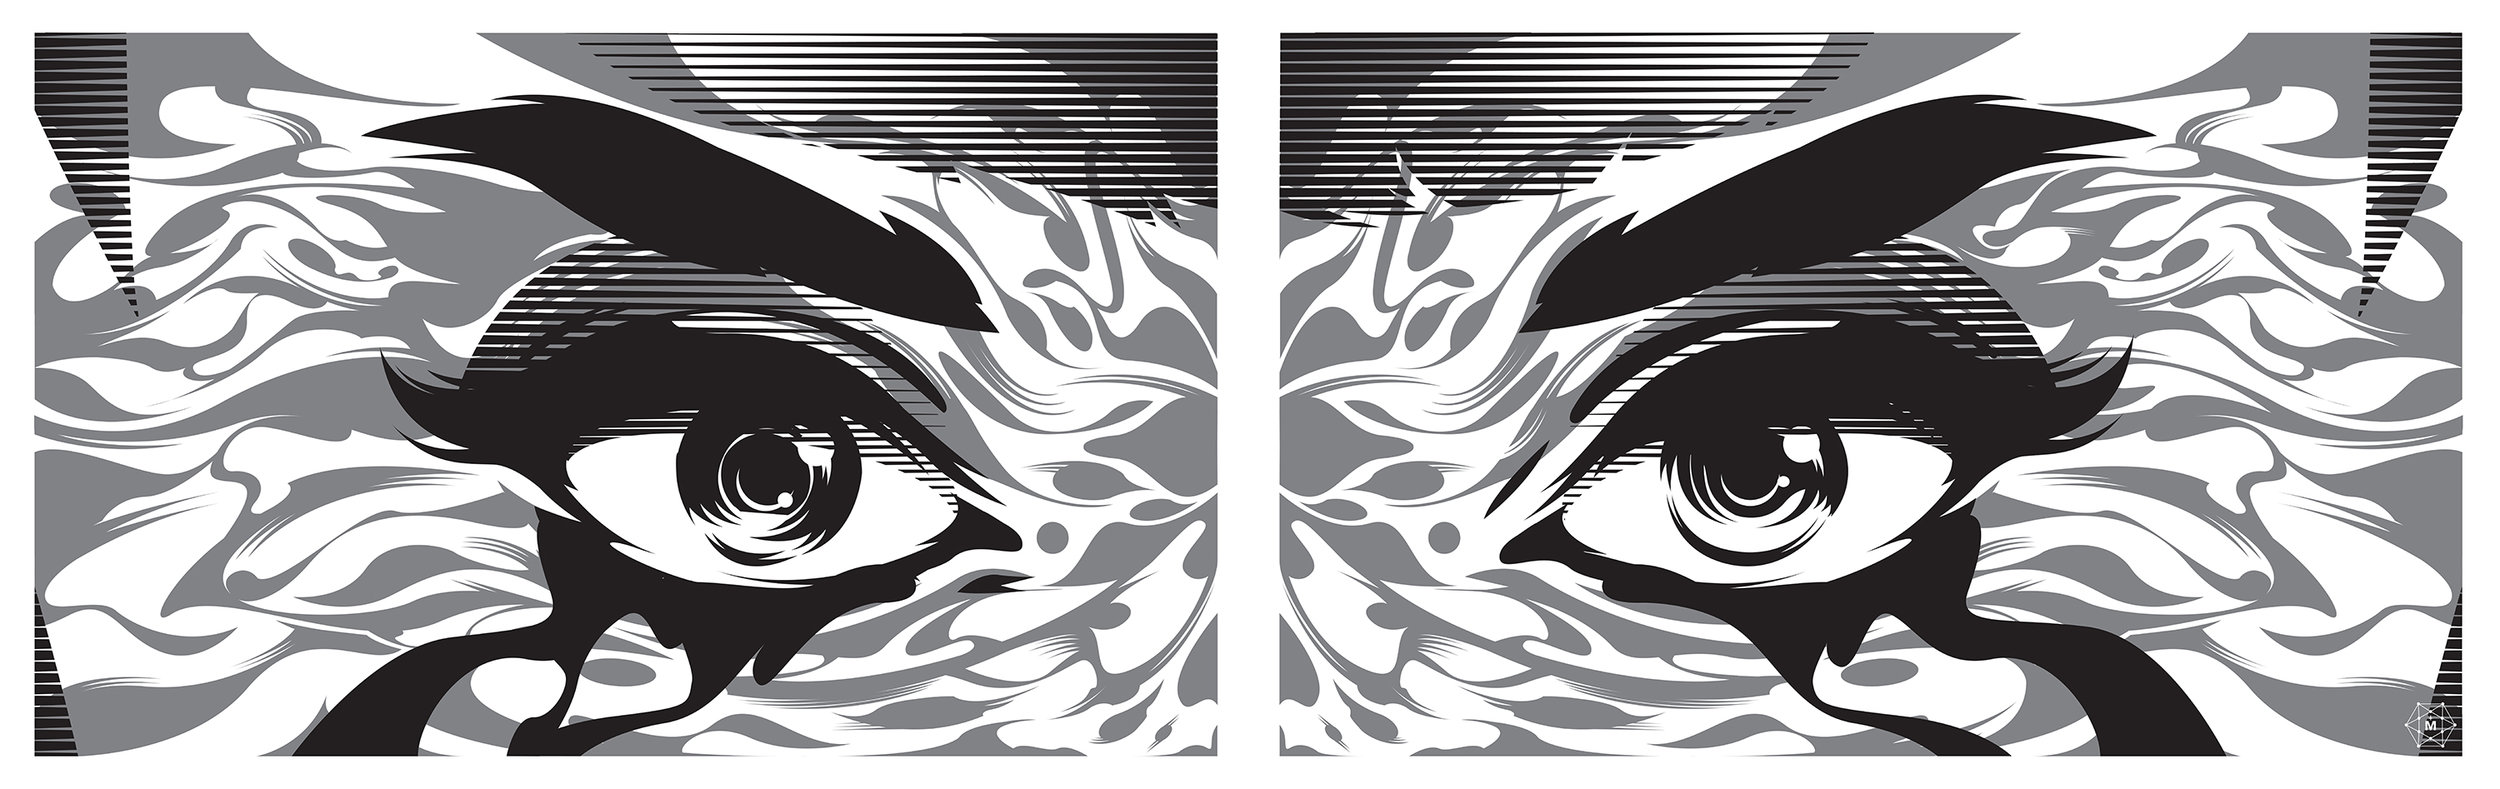 Hypnotic-01 SS.jpg